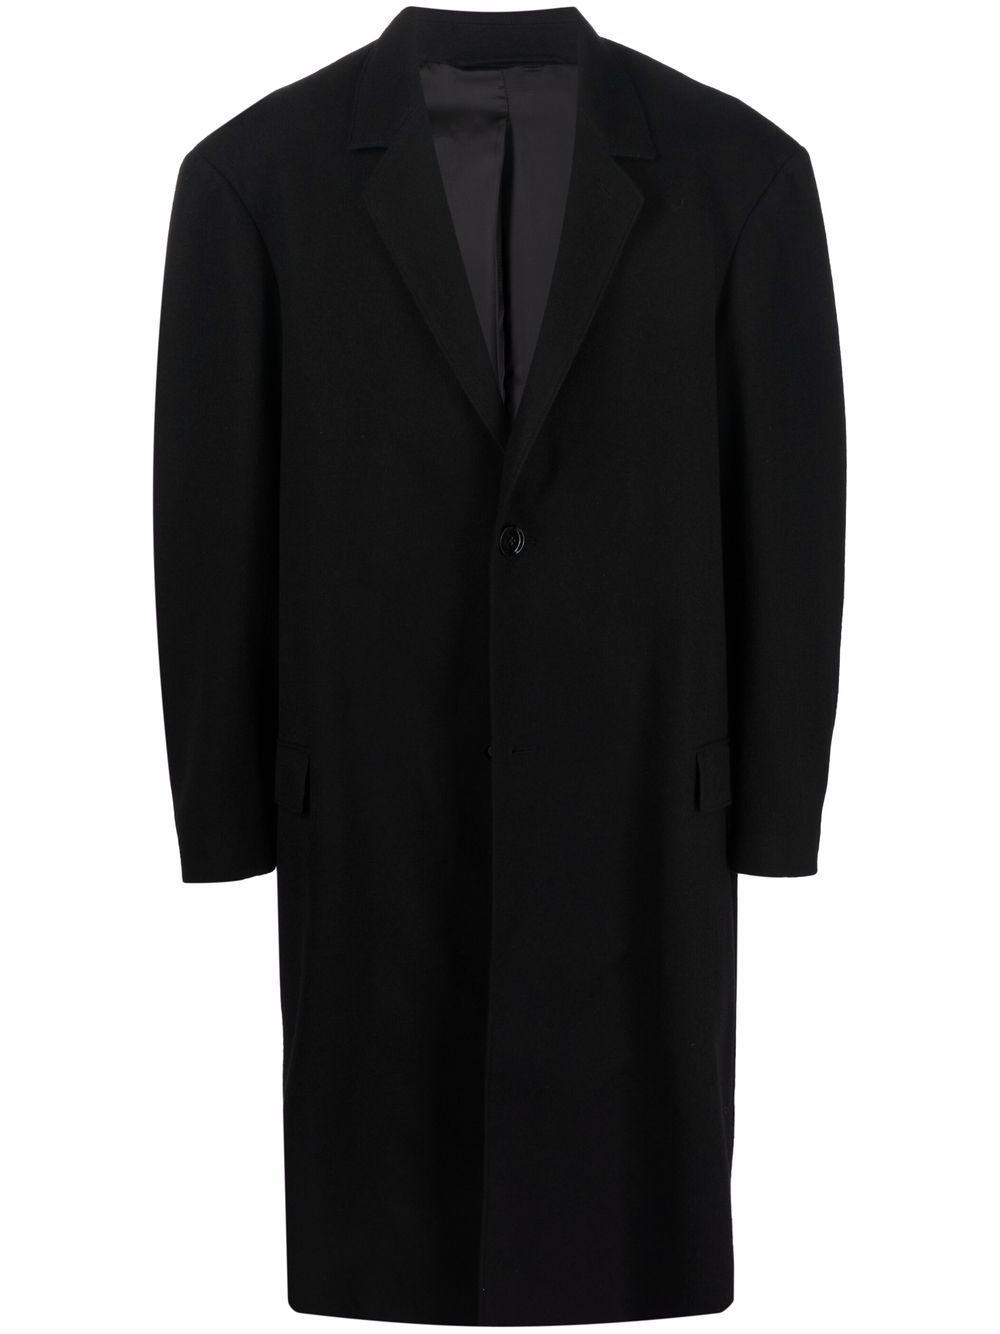 cappotto oversize a 2 bottoni LEMAIRE | Cappotto | M213CO167LF608999